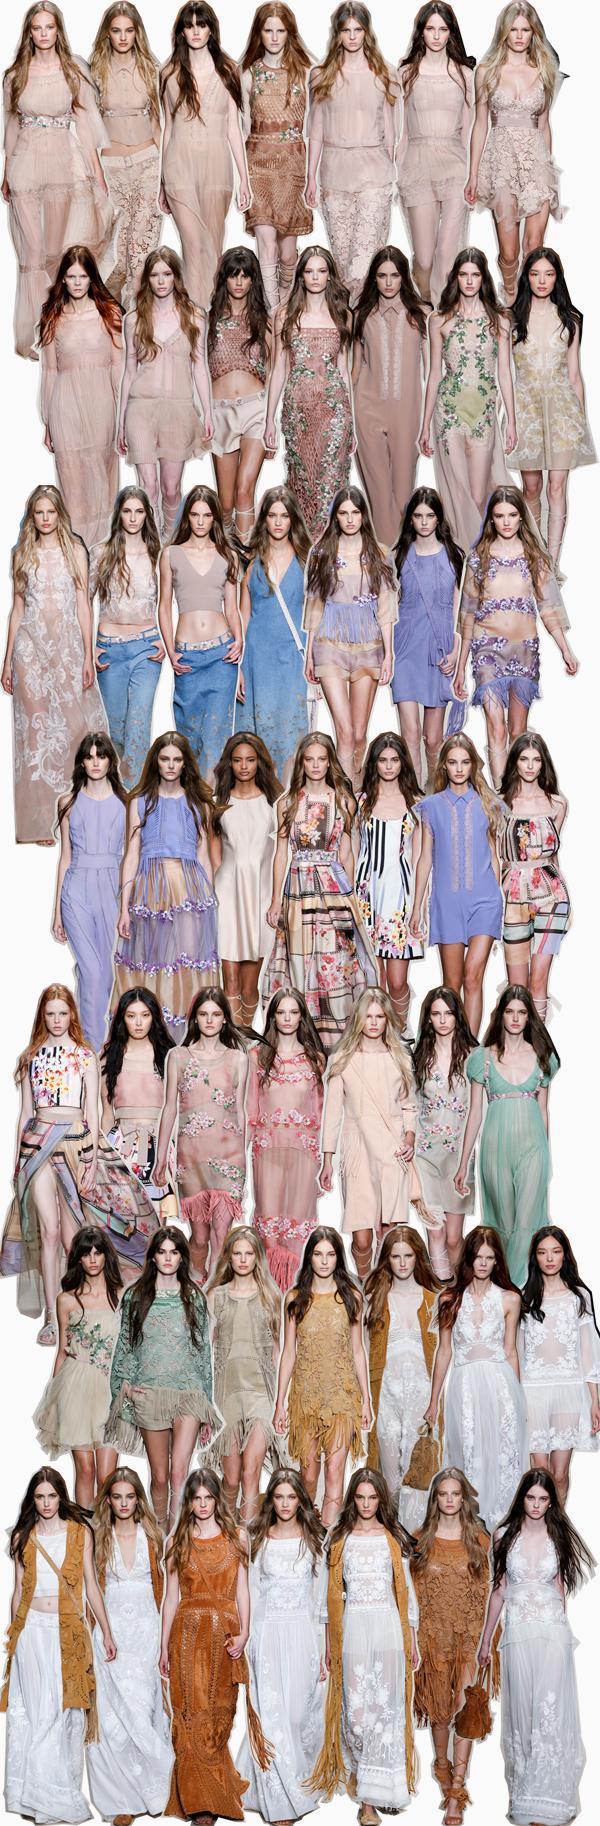 Alberta Ferretti Spring 2015 fashion show